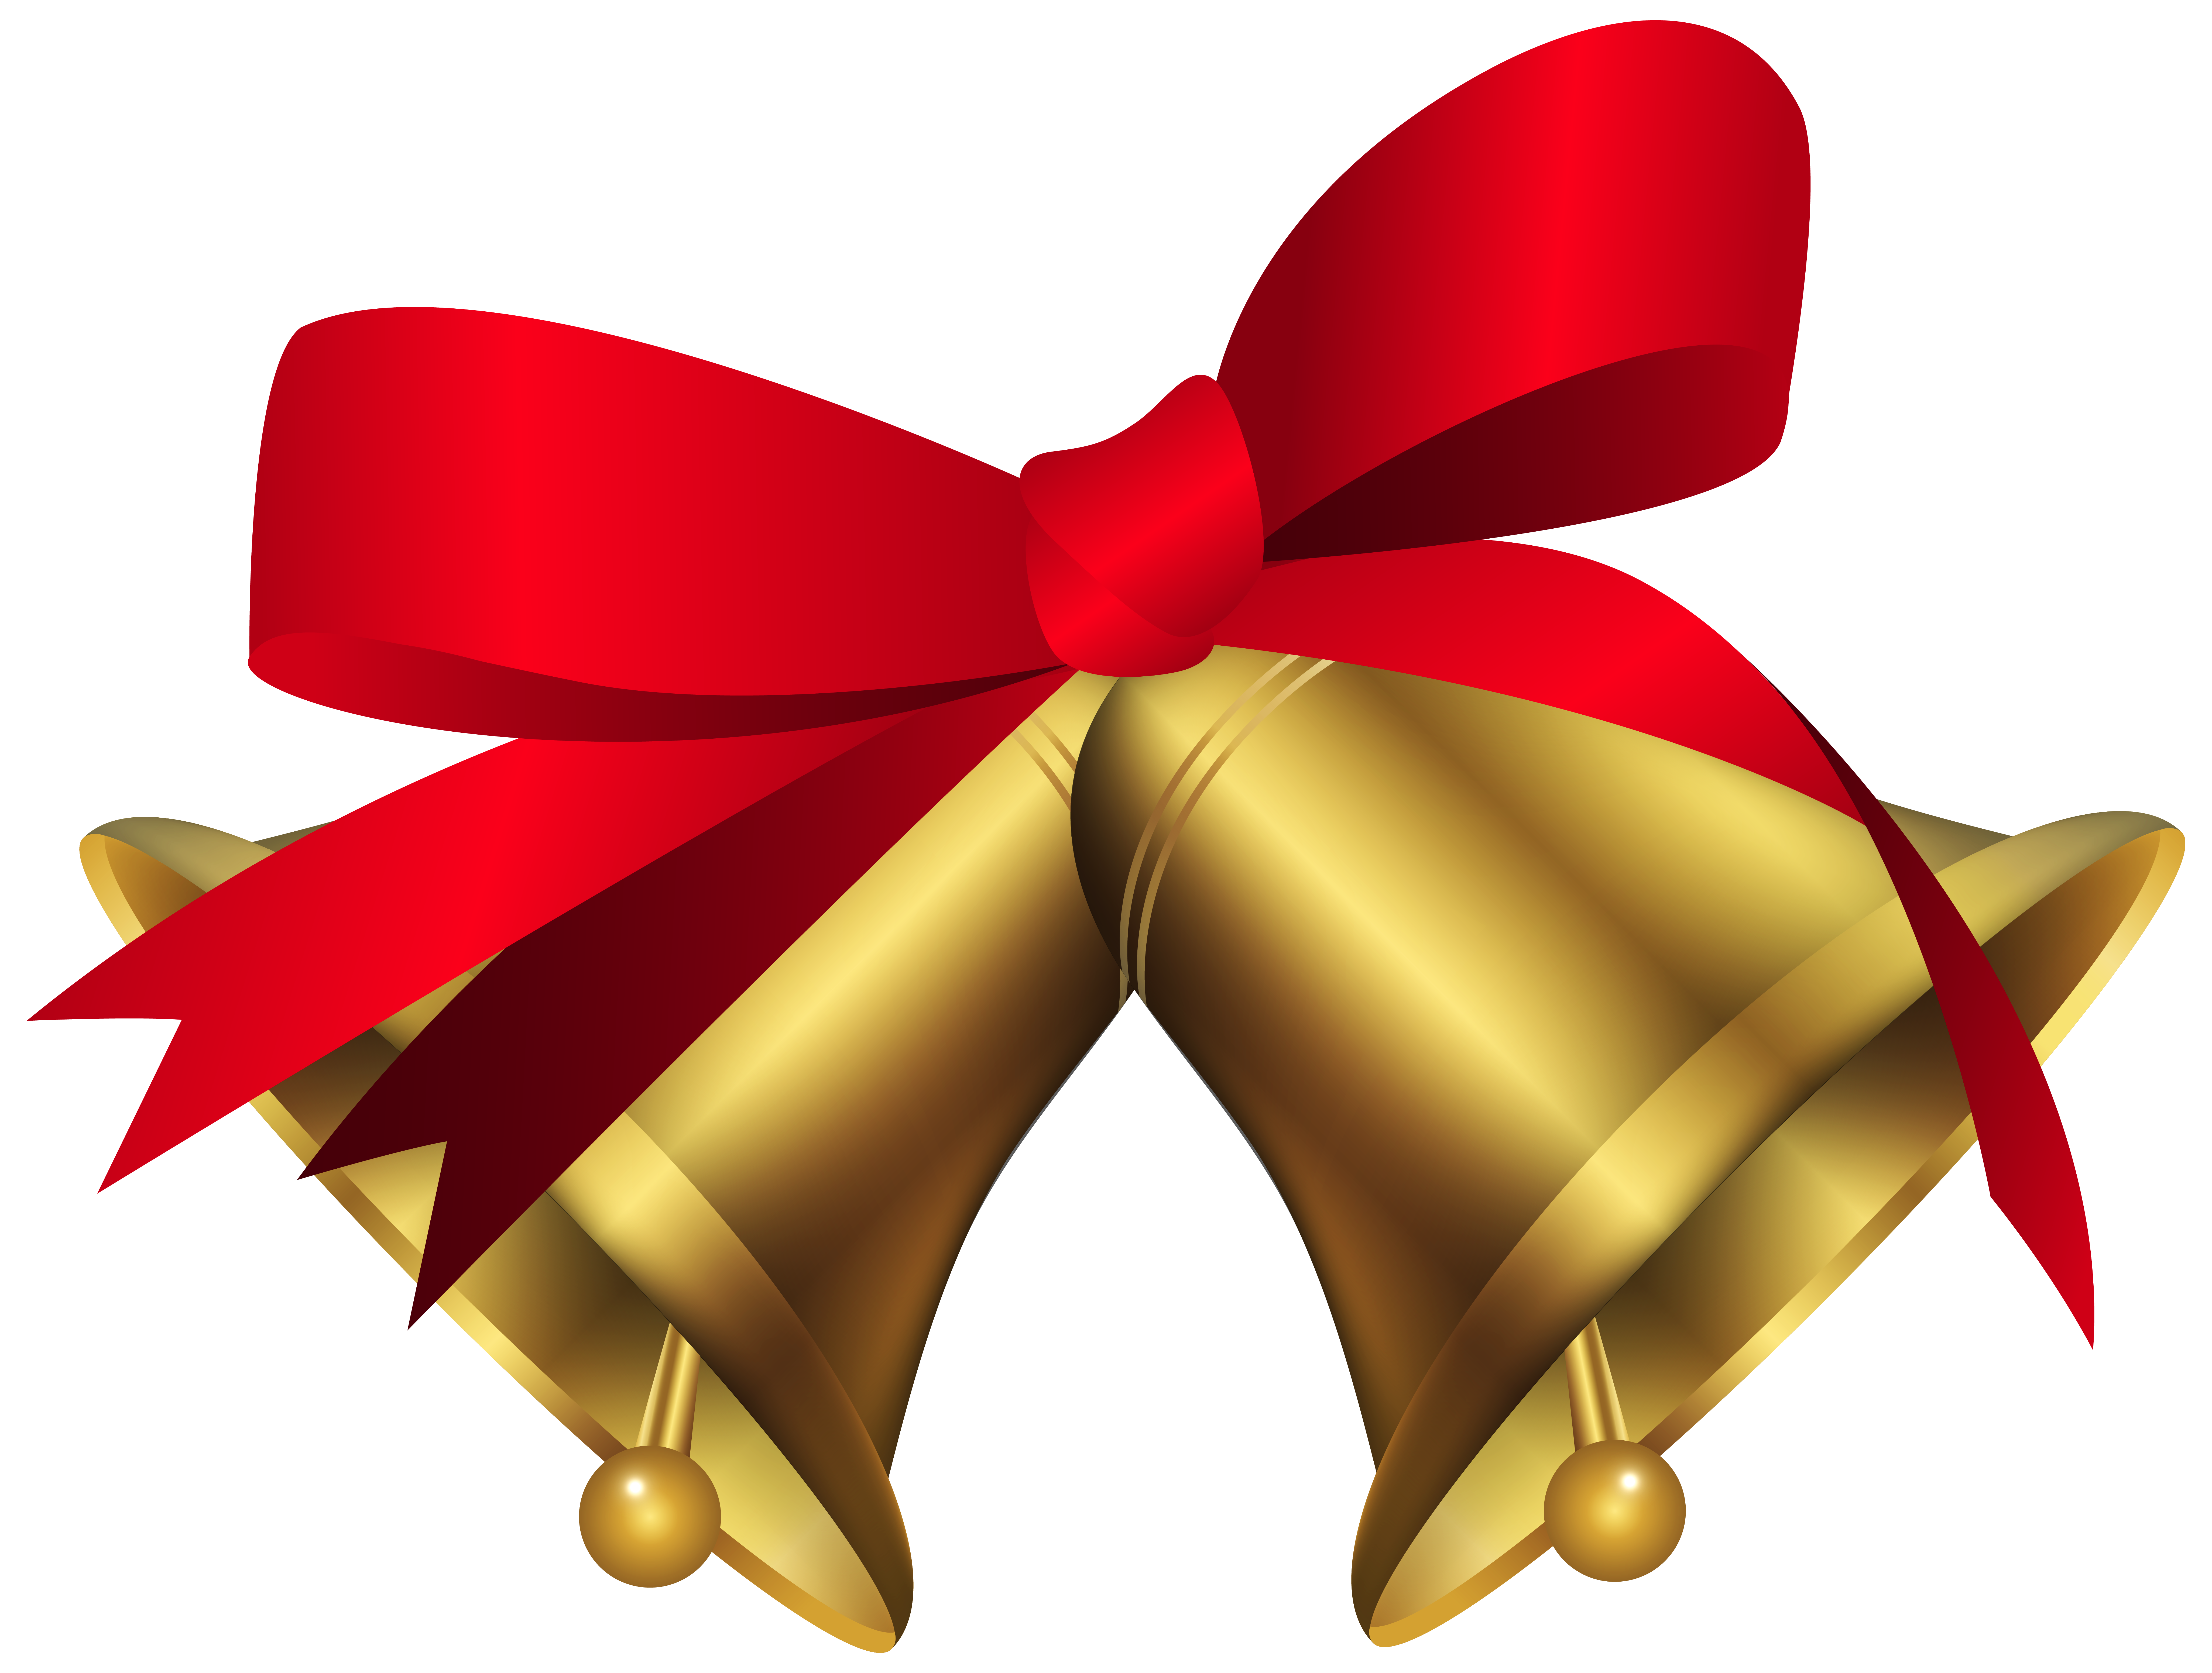 Christmas jingle bell clipart image free stock Christmas Bells with Red Bow PNG Clip Art Image | CHRISTMAS ... image free stock